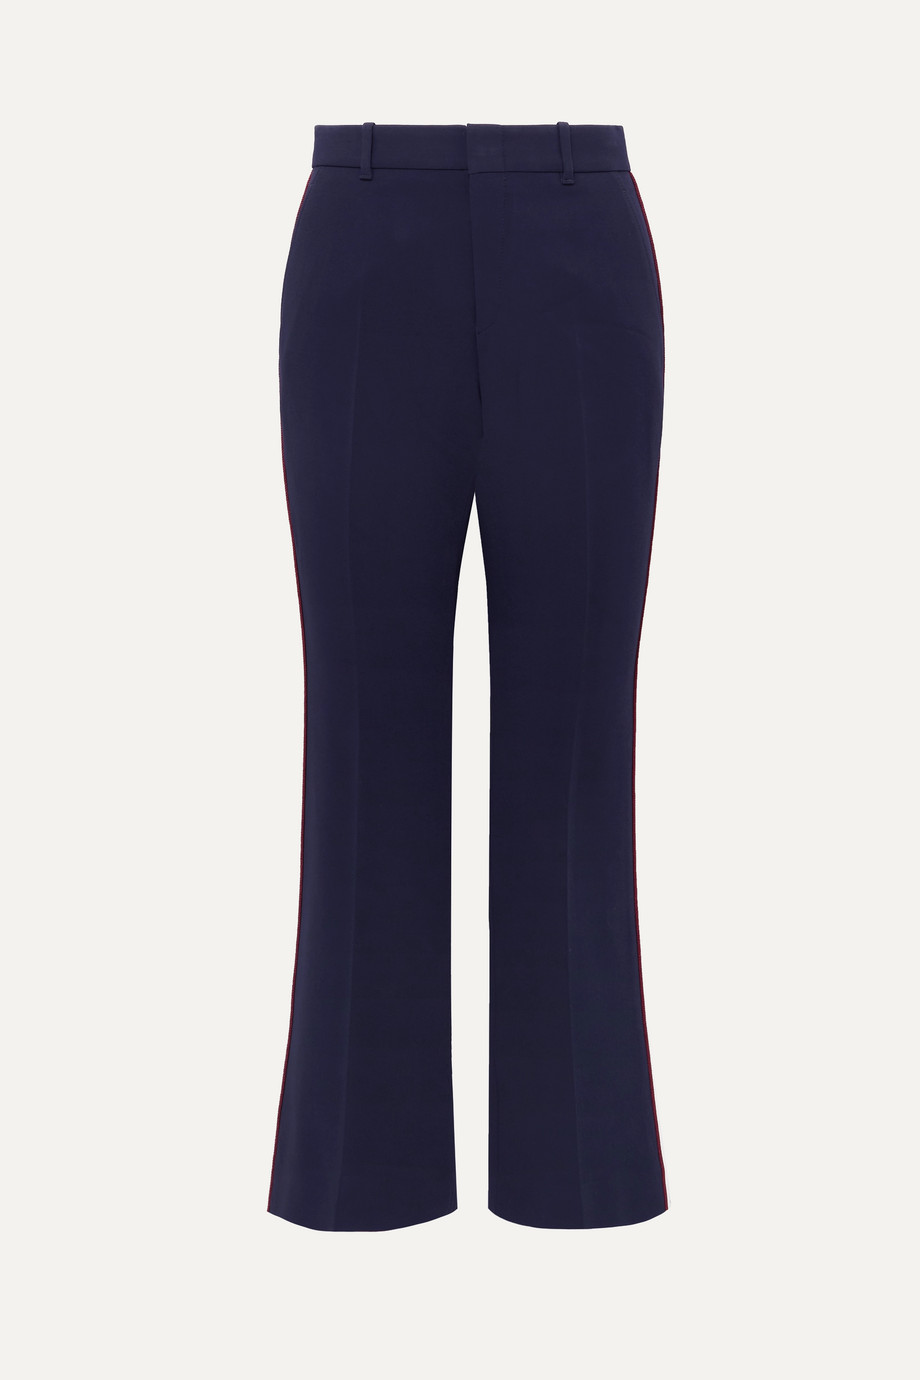 Gucci Grosgrain-trimmed cady wide-leg pants